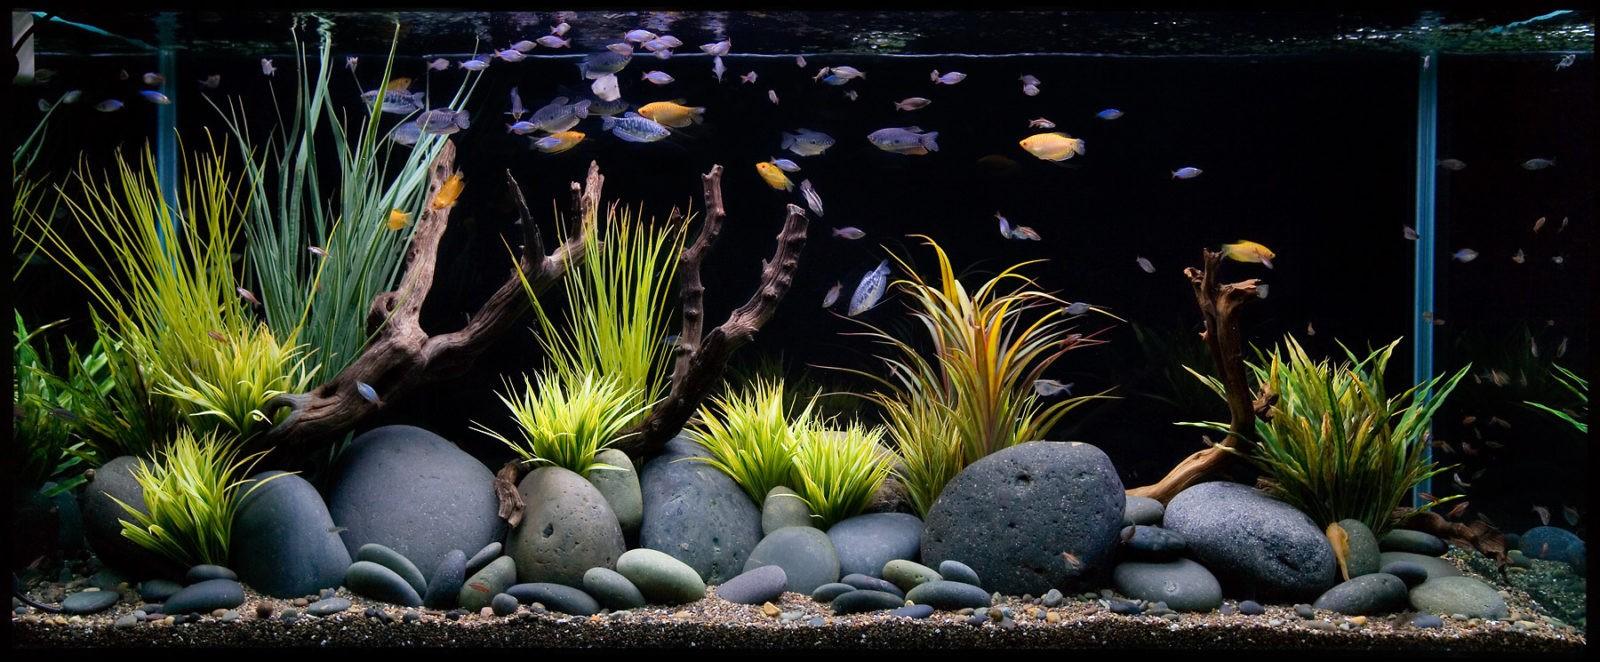 Aquarium-Artificial-Plant-Grass-2